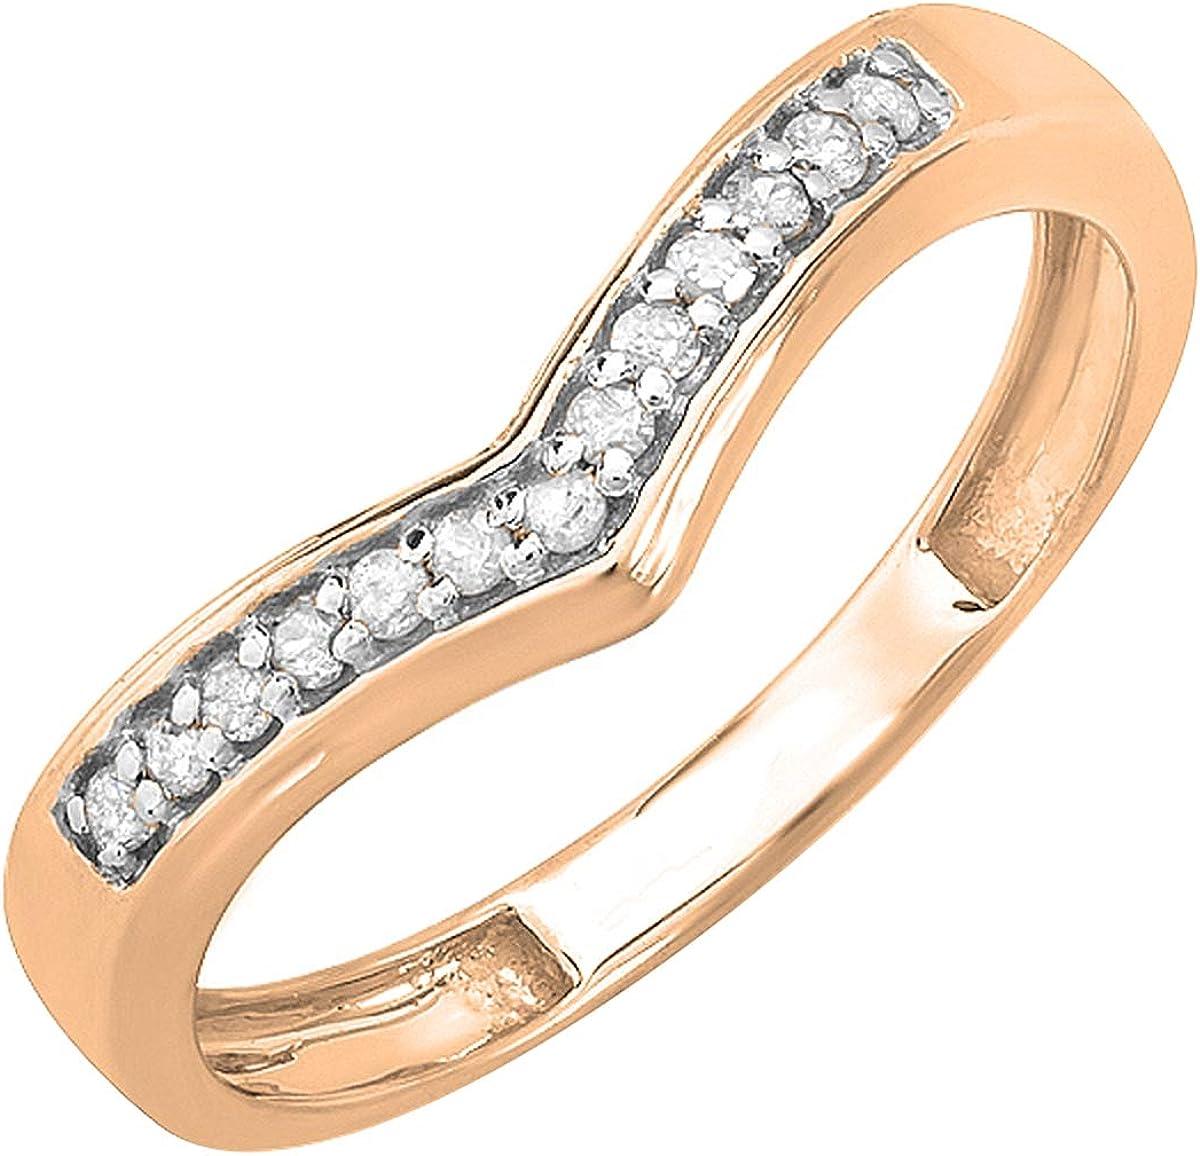 ctw Dazzlingrock Collection 0.15 Carat Round Diamond Wedding Stackable Band Anniversary Guard Chevron Ring 10K Gold